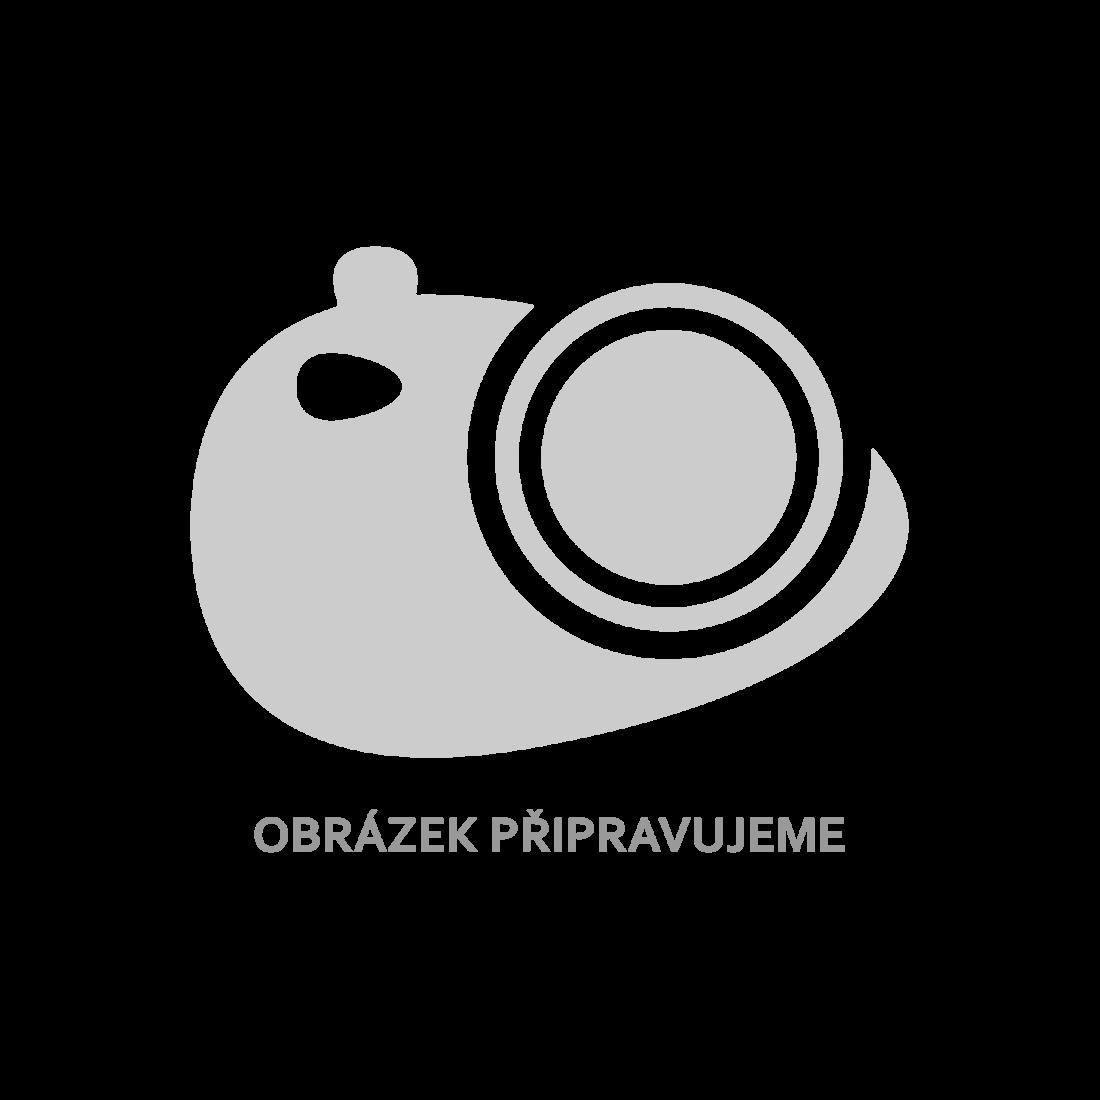 vidaXL Židle Batavia 2 ks s tmavě šedými poduškami masivní teak [316029]